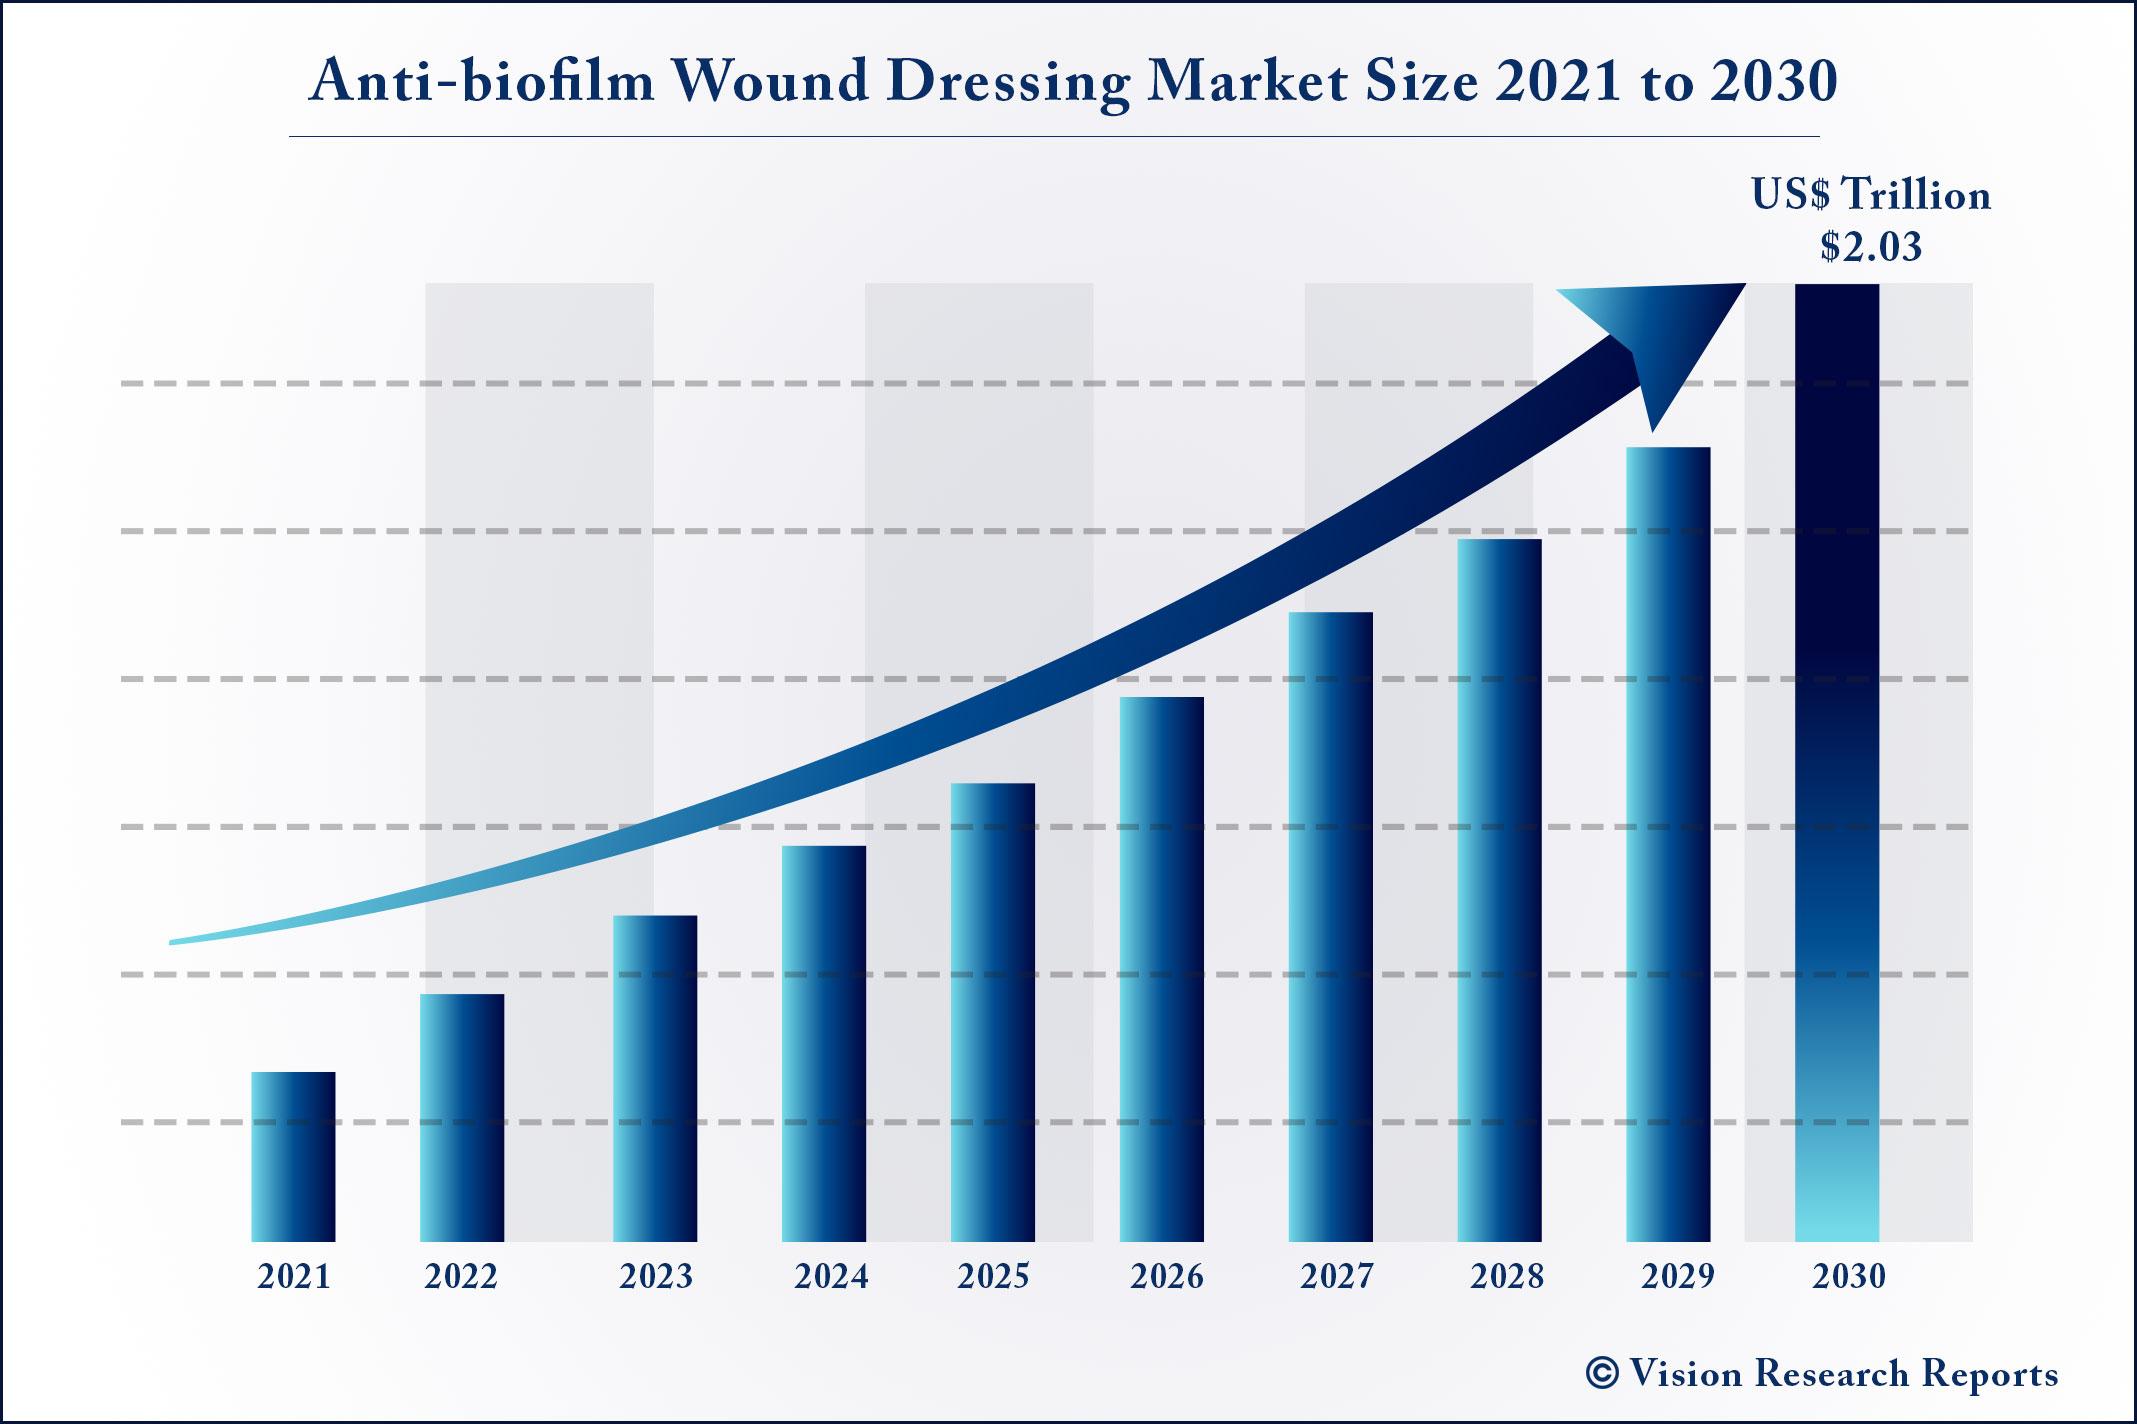 Anti-biofilm Wound Dressing Market Size 2021 to 2030